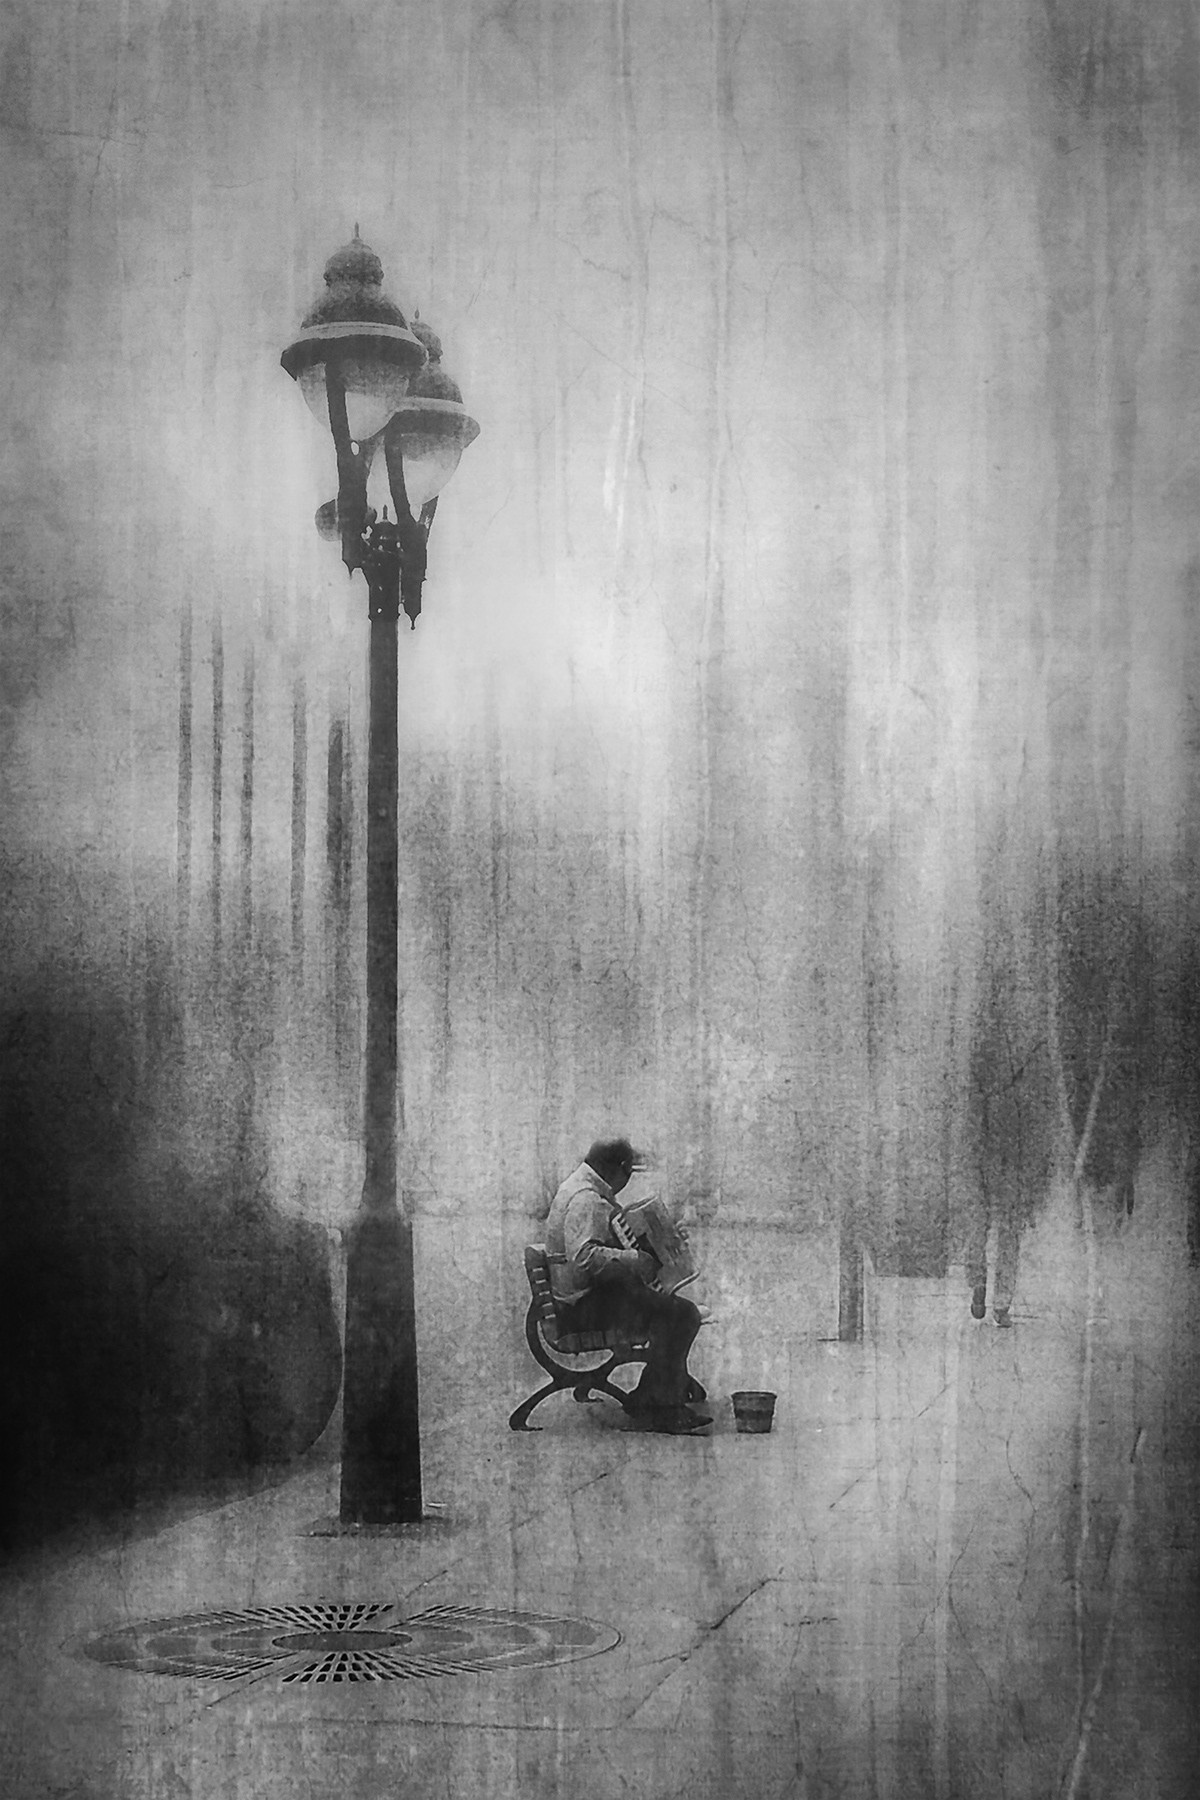 Музыкант. Автор Даниэль Кастонгуэй